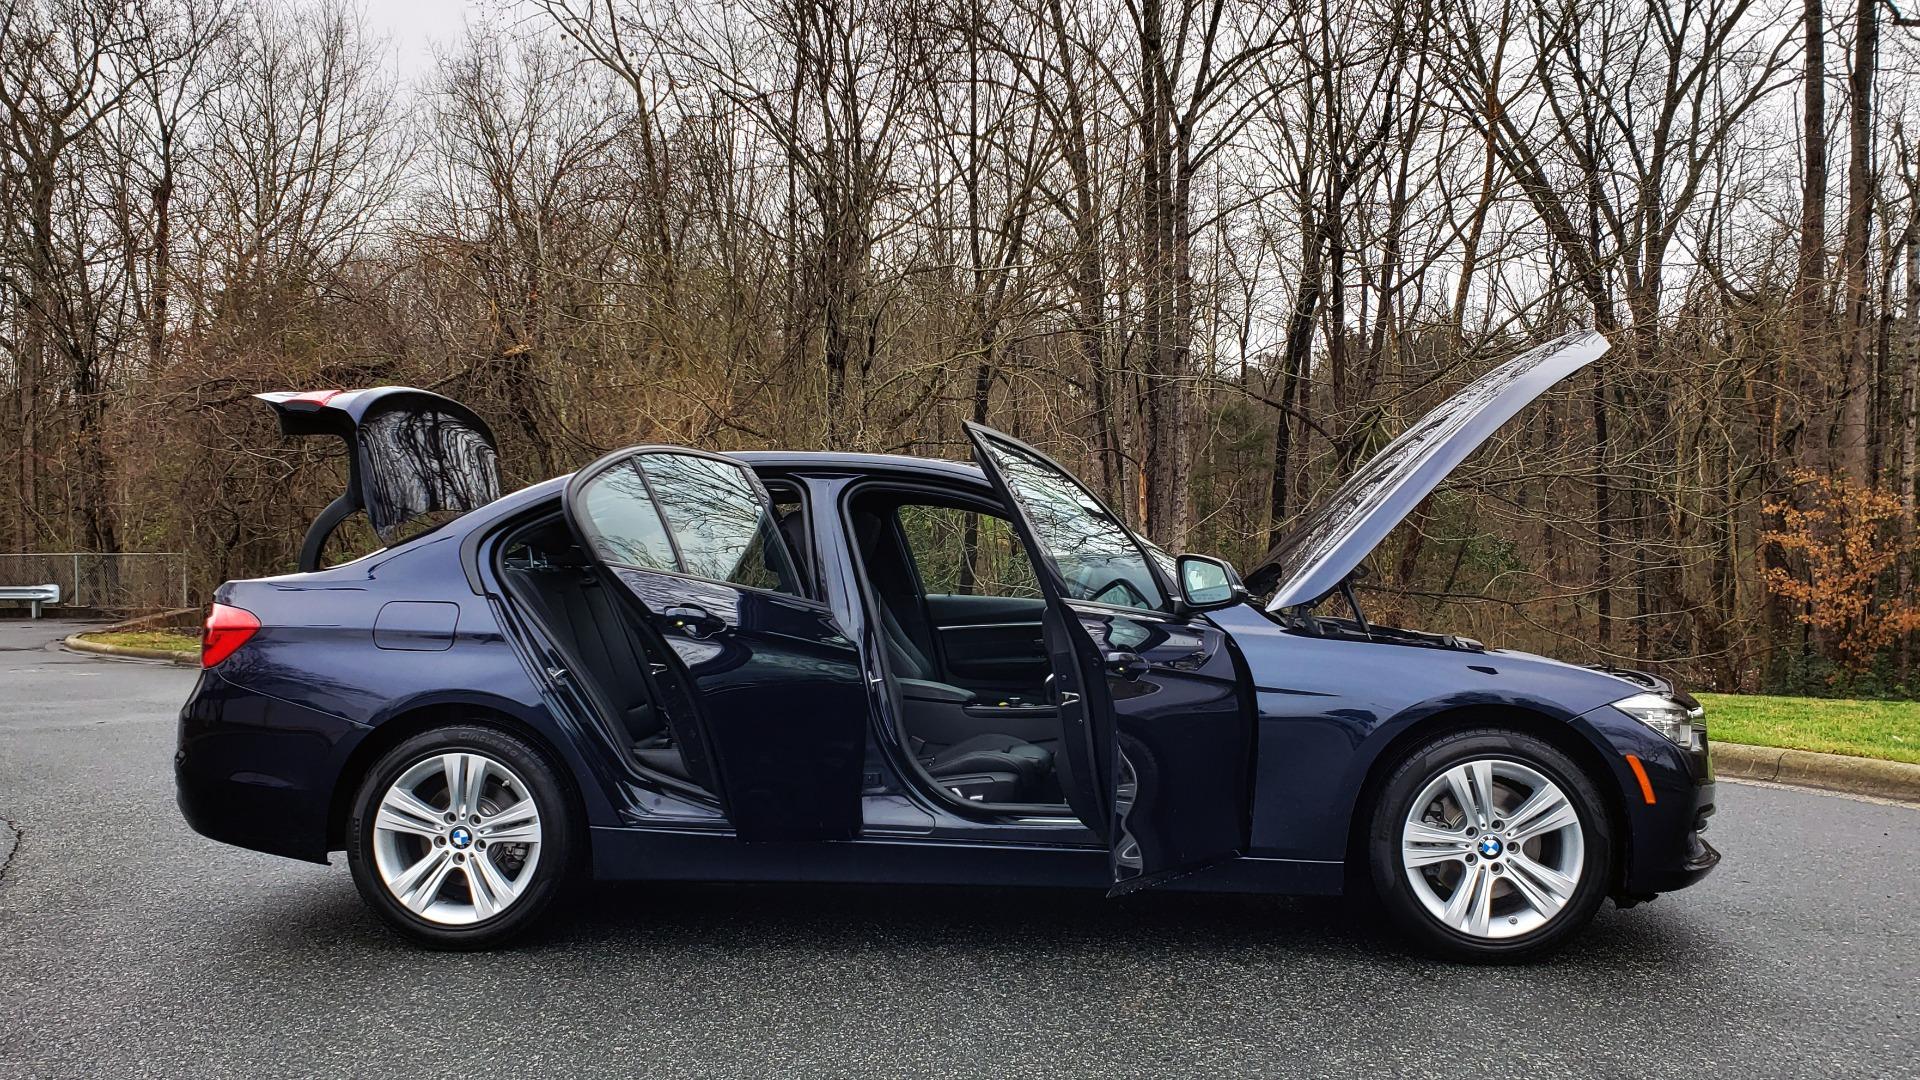 Used 2016 BMW 3 SERIES 328I PREMIUM PKG / DRVR ASST / SUNROOF / PARK ASST for sale Sold at Formula Imports in Charlotte NC 28227 9